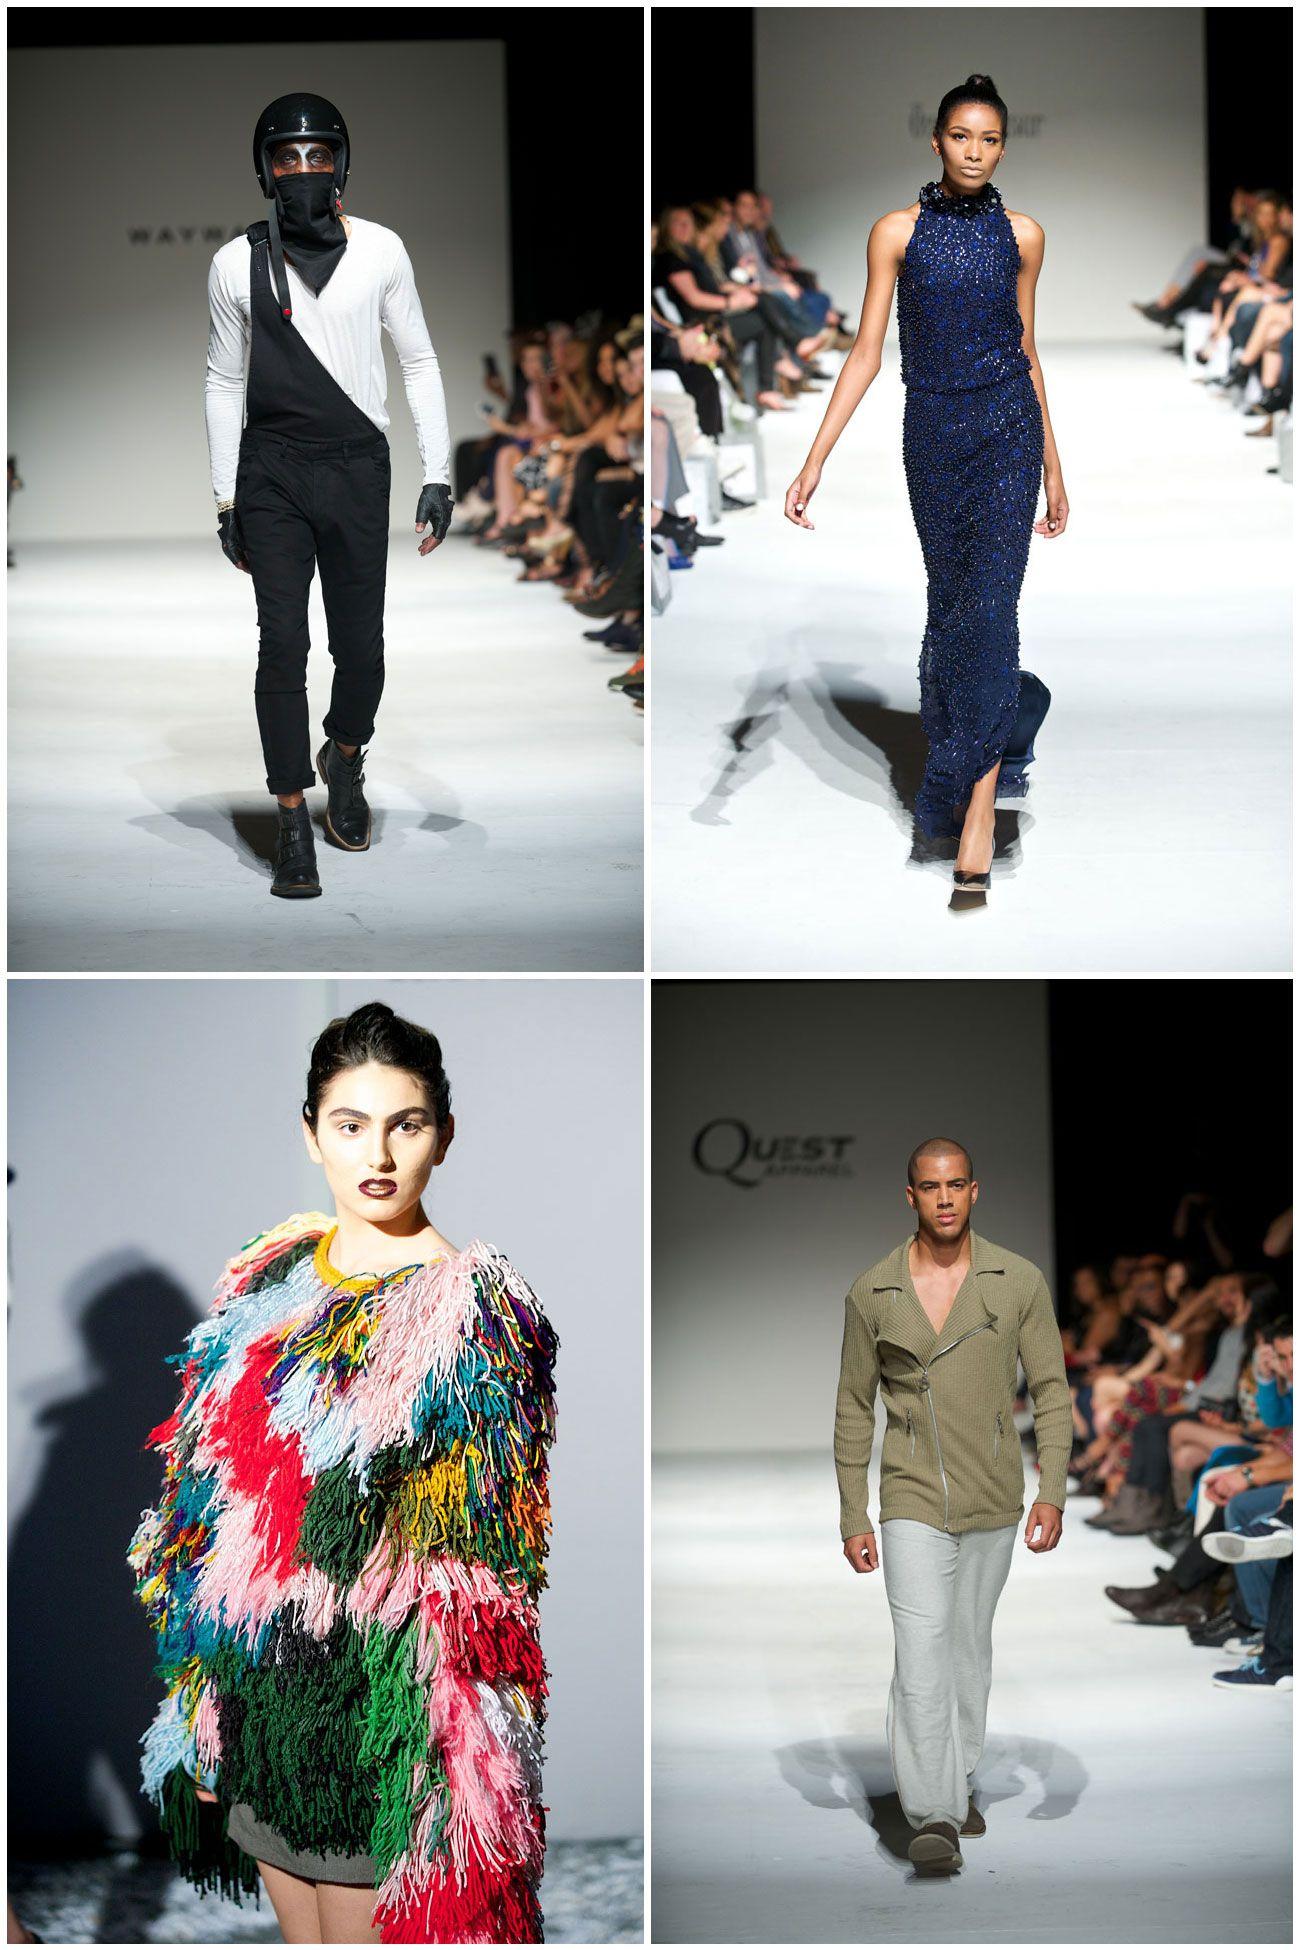 Los Angeles Fashion Week Fall 2014 Los Angeles Fashion Week Los Angeles Style Fashion Week